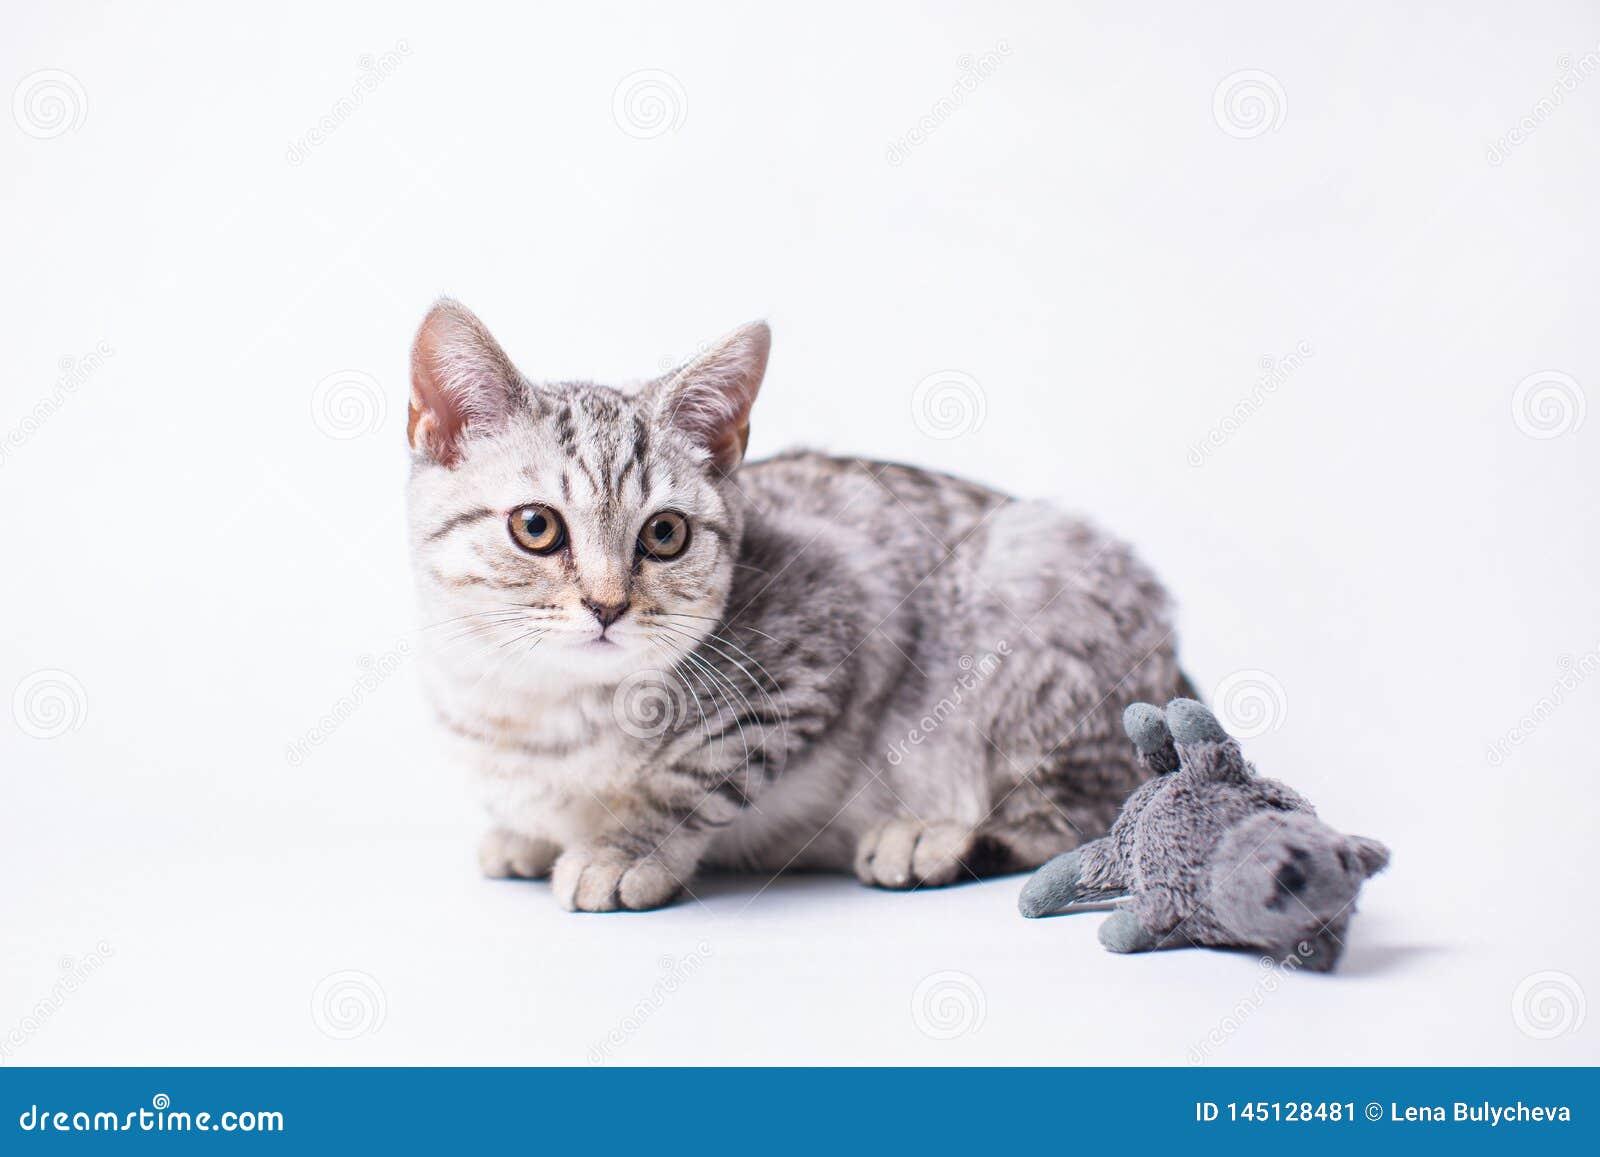 Little cat siting on the white floor